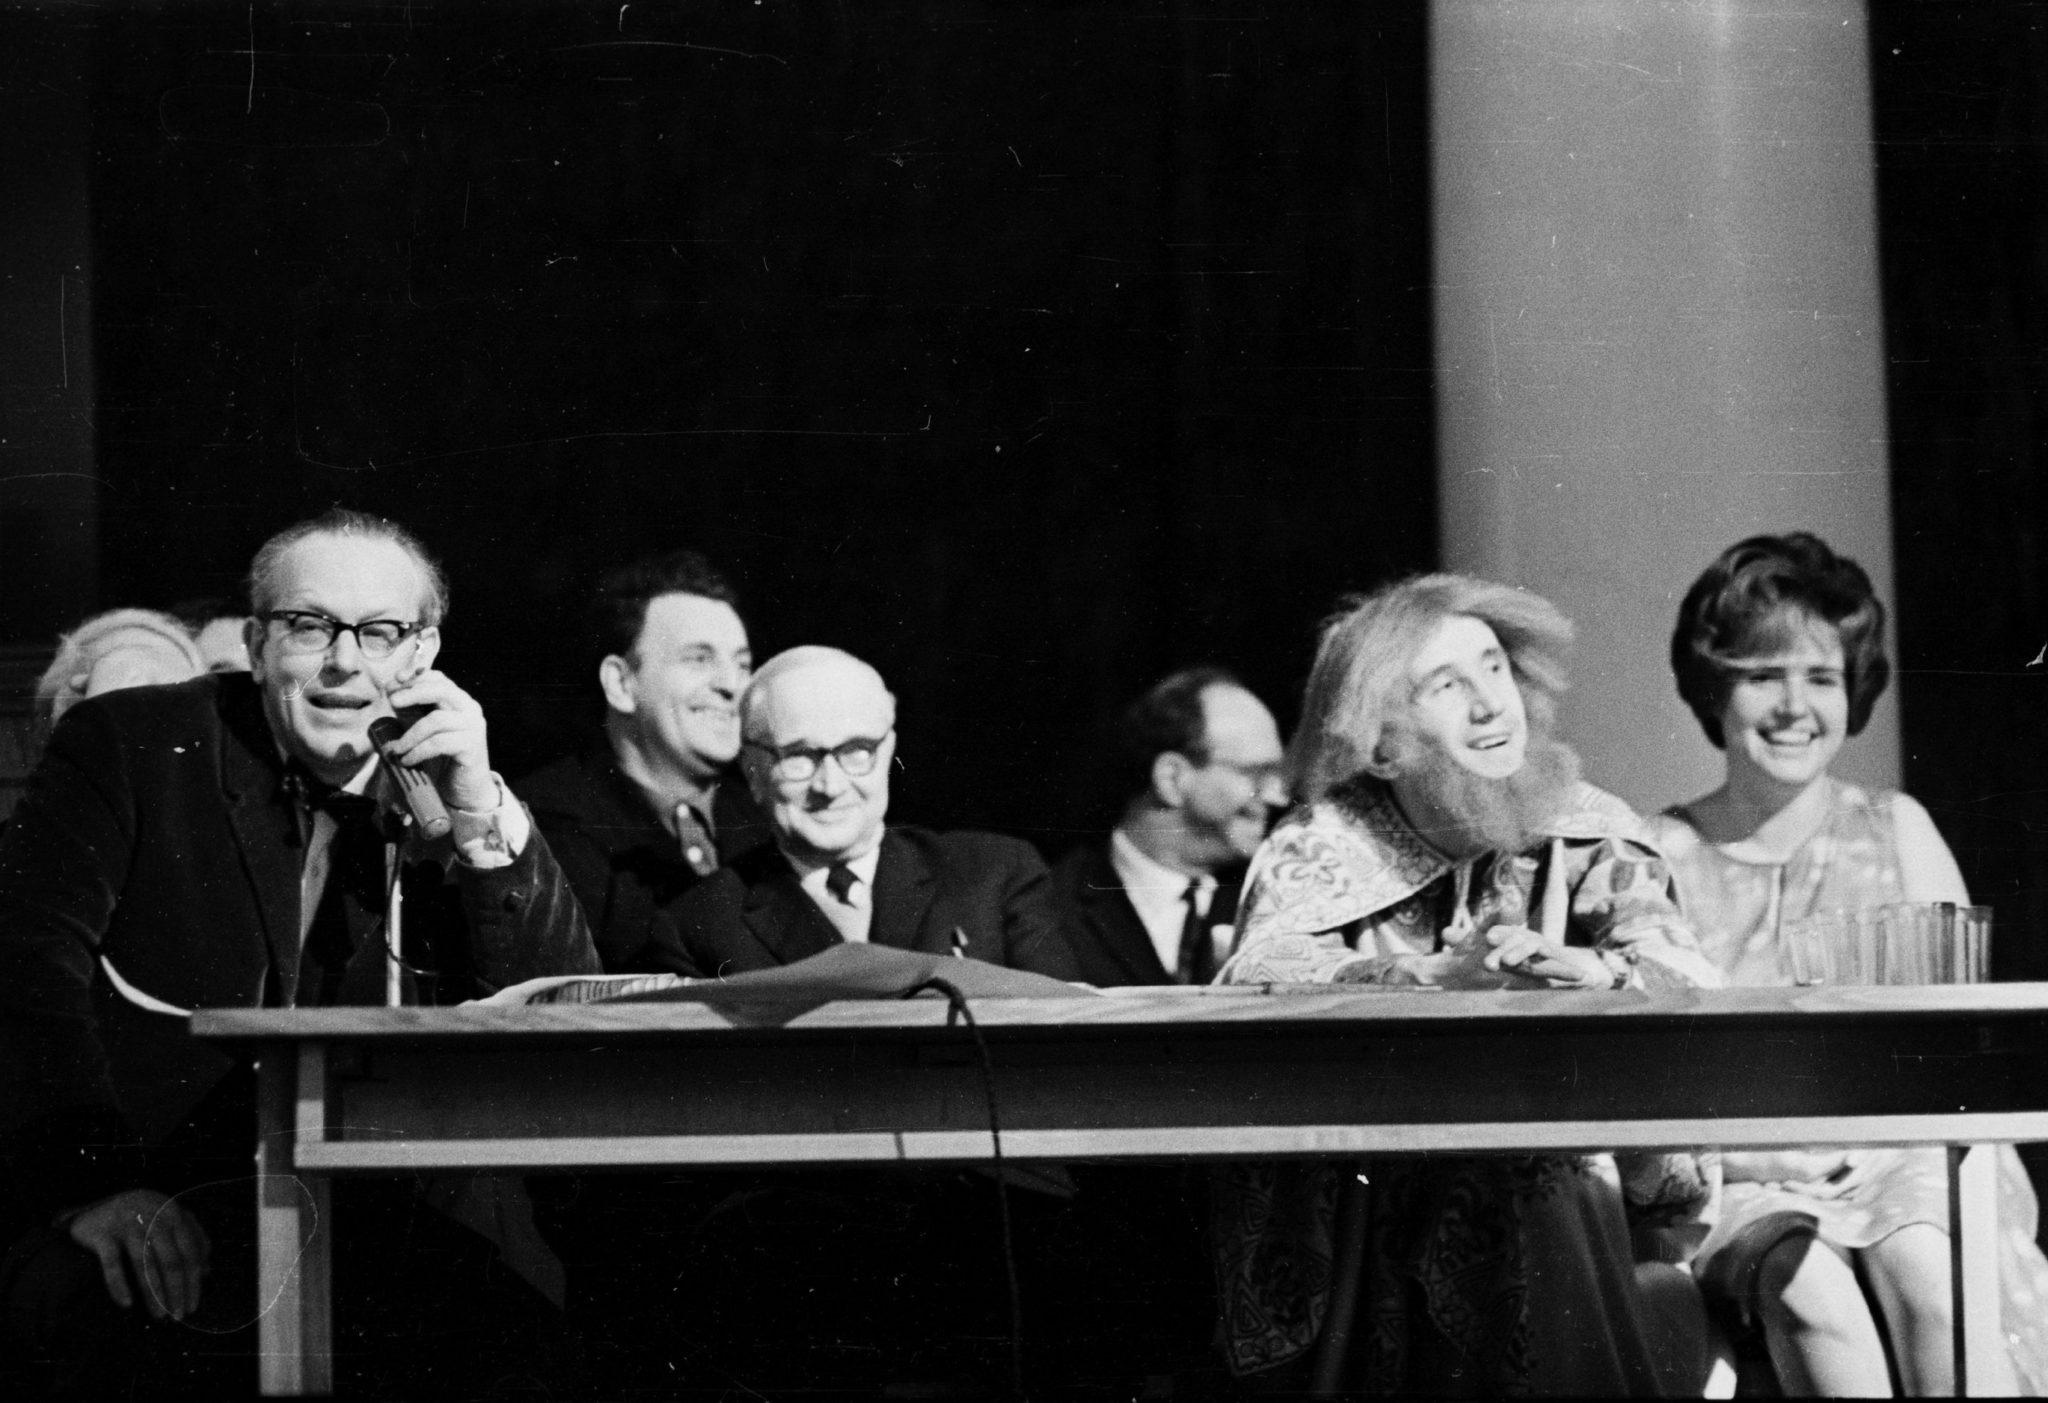 День физика на физфаке ЛГУ (1967). Президиум в актовом зале, справа студент, играющий роль Архимеда. Др. фото и воспоминания см. nrd.pnpi.spb.ru/history/LGU-60e.pdf